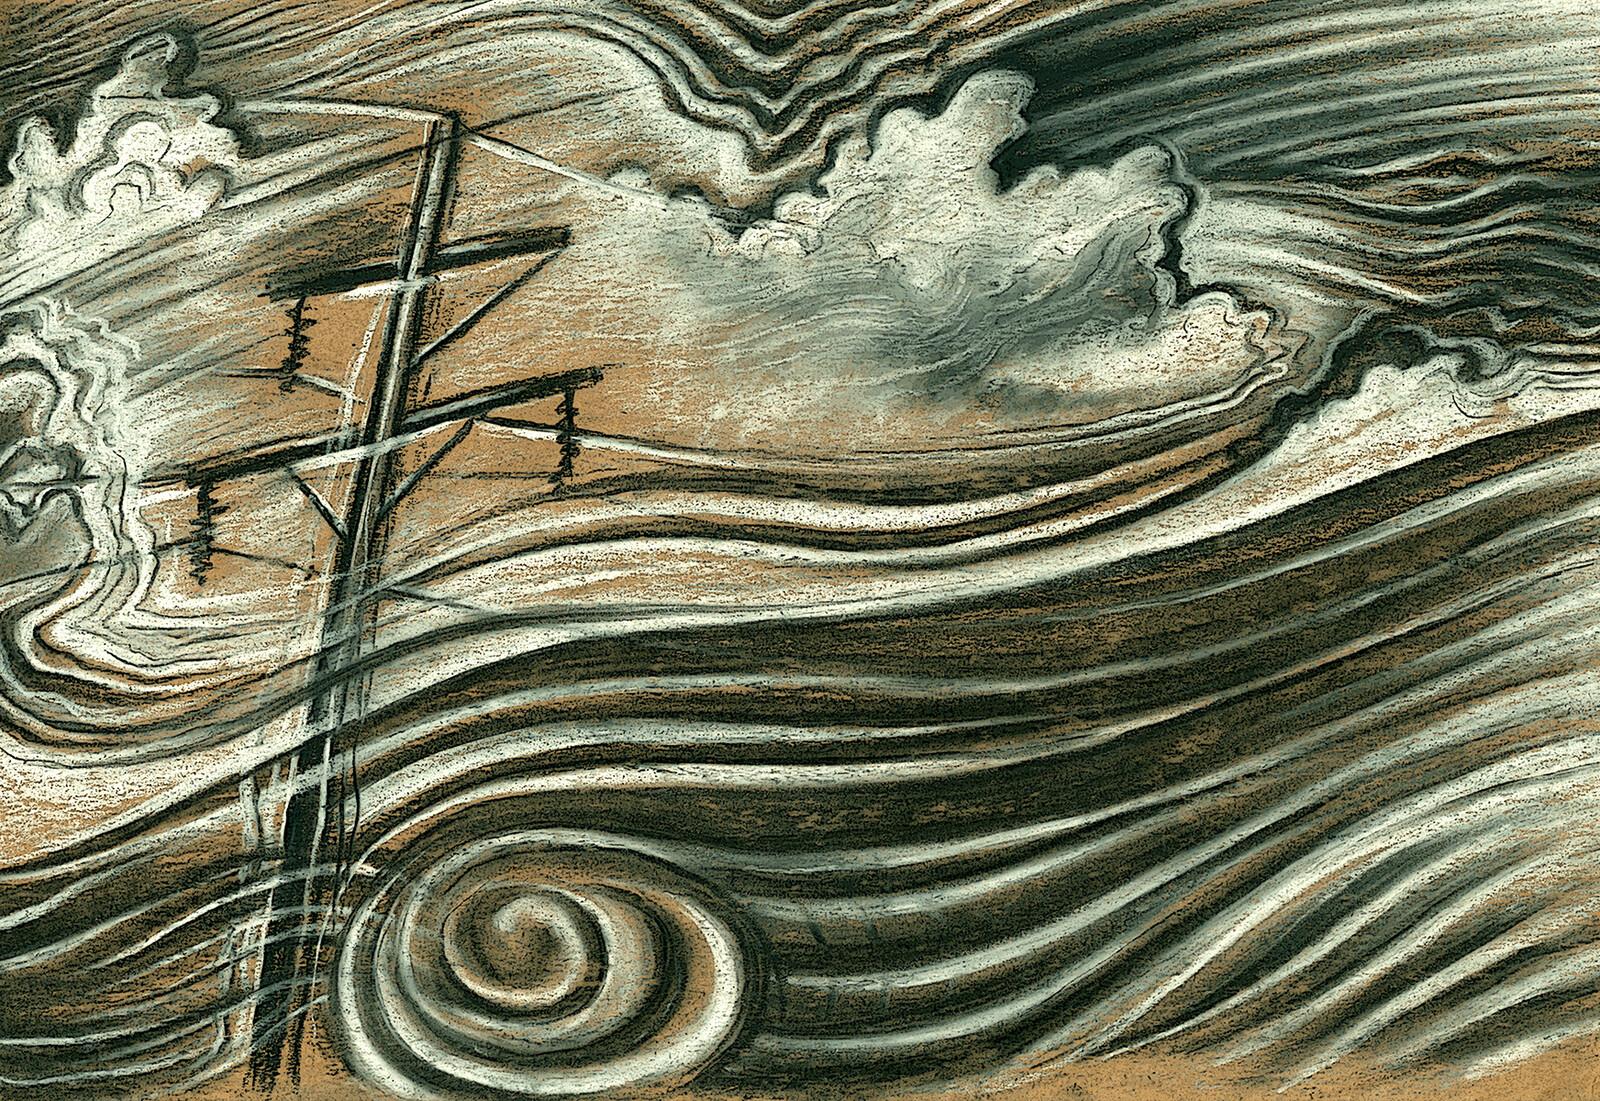 Charcoal & chalk illustration